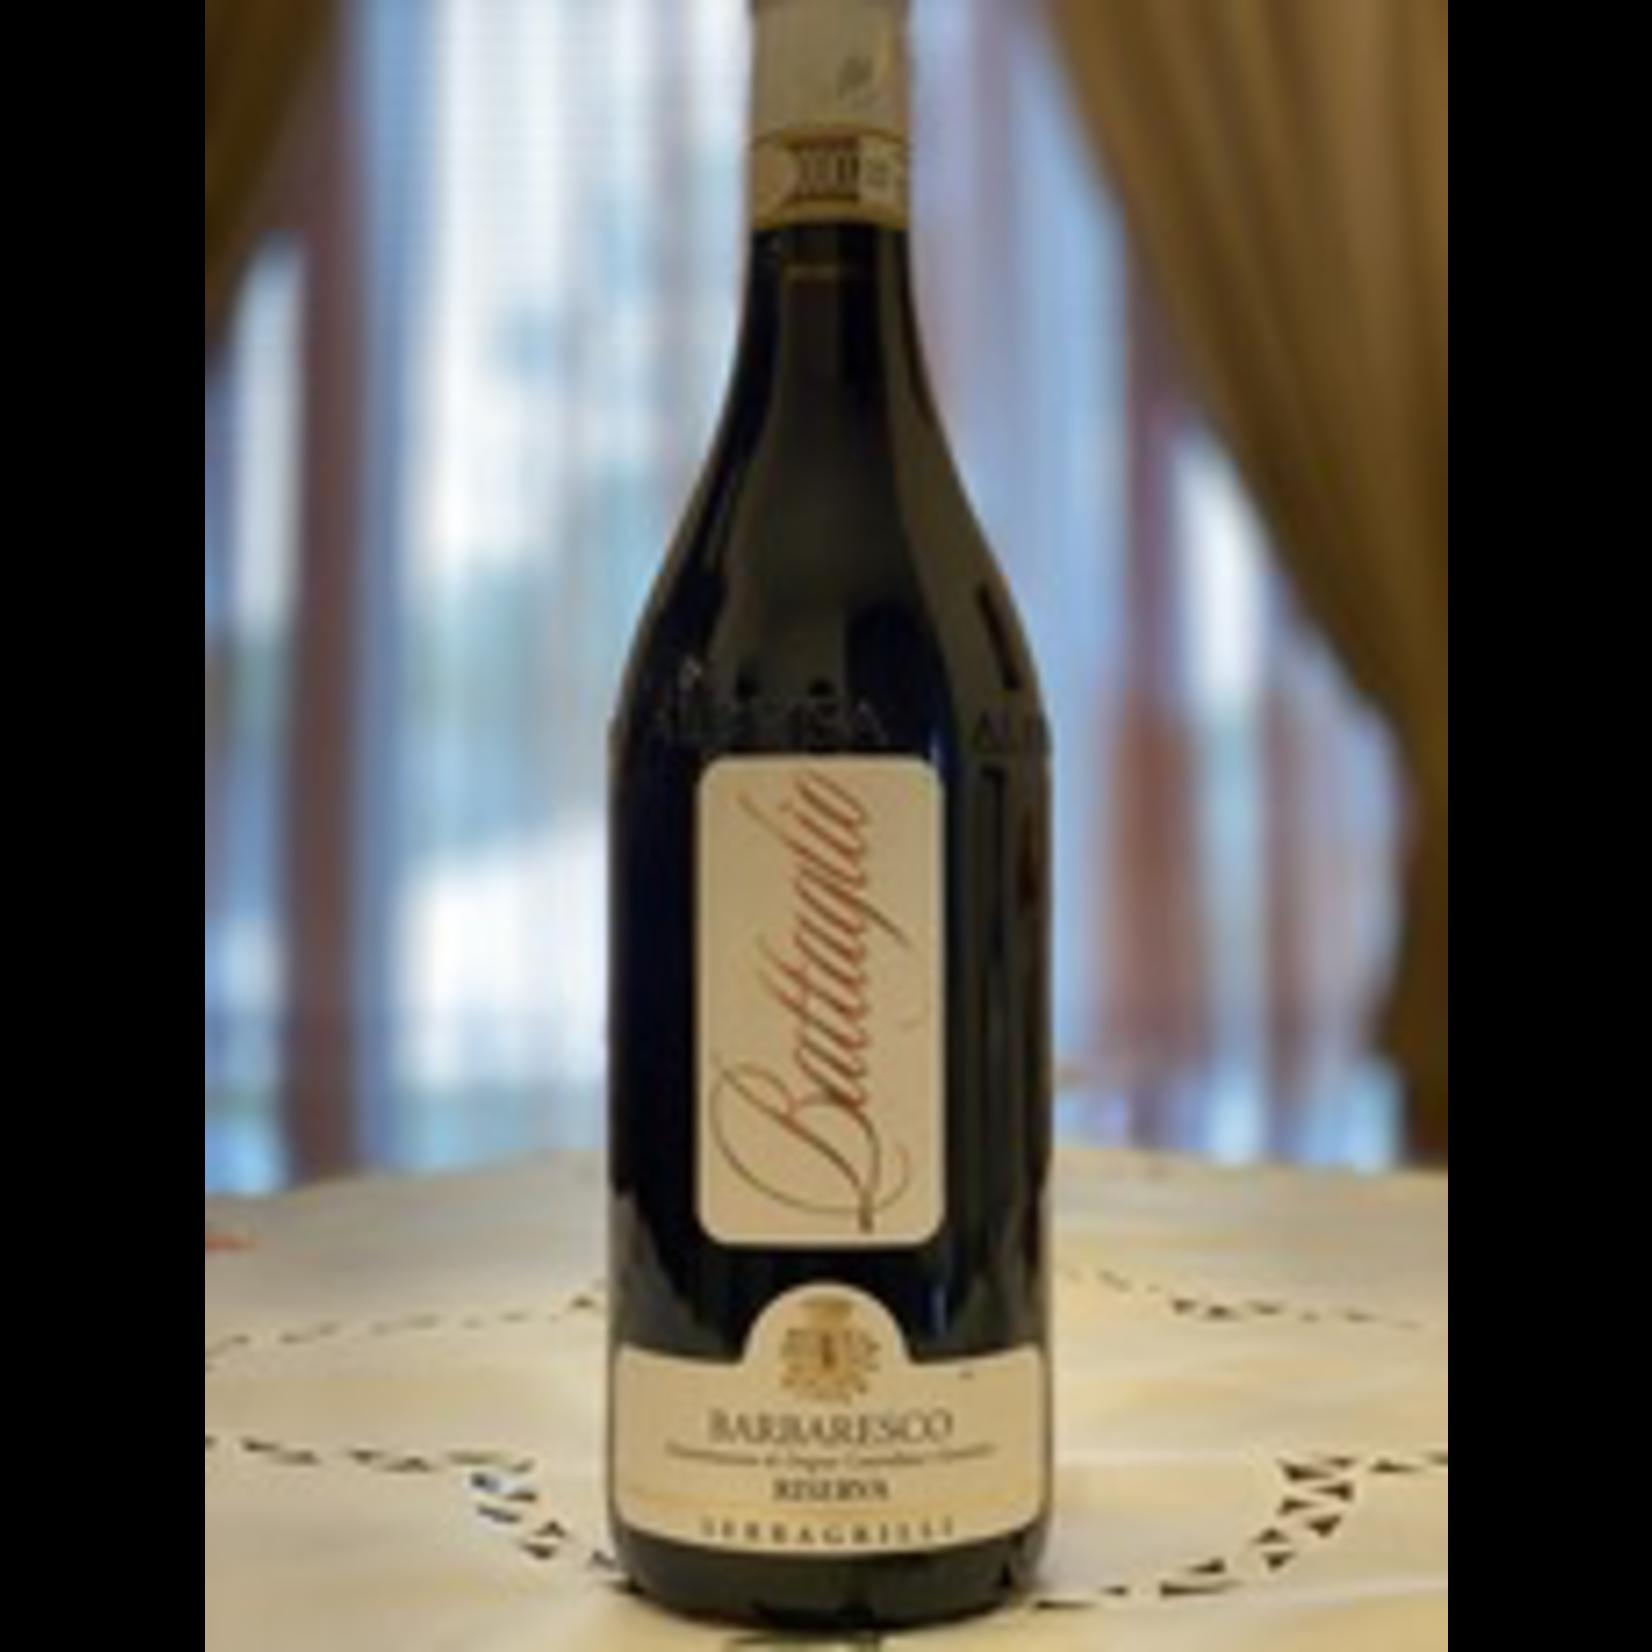 Wine Battaglio Barbaresco Riserva Single Vineyard Cru 2015